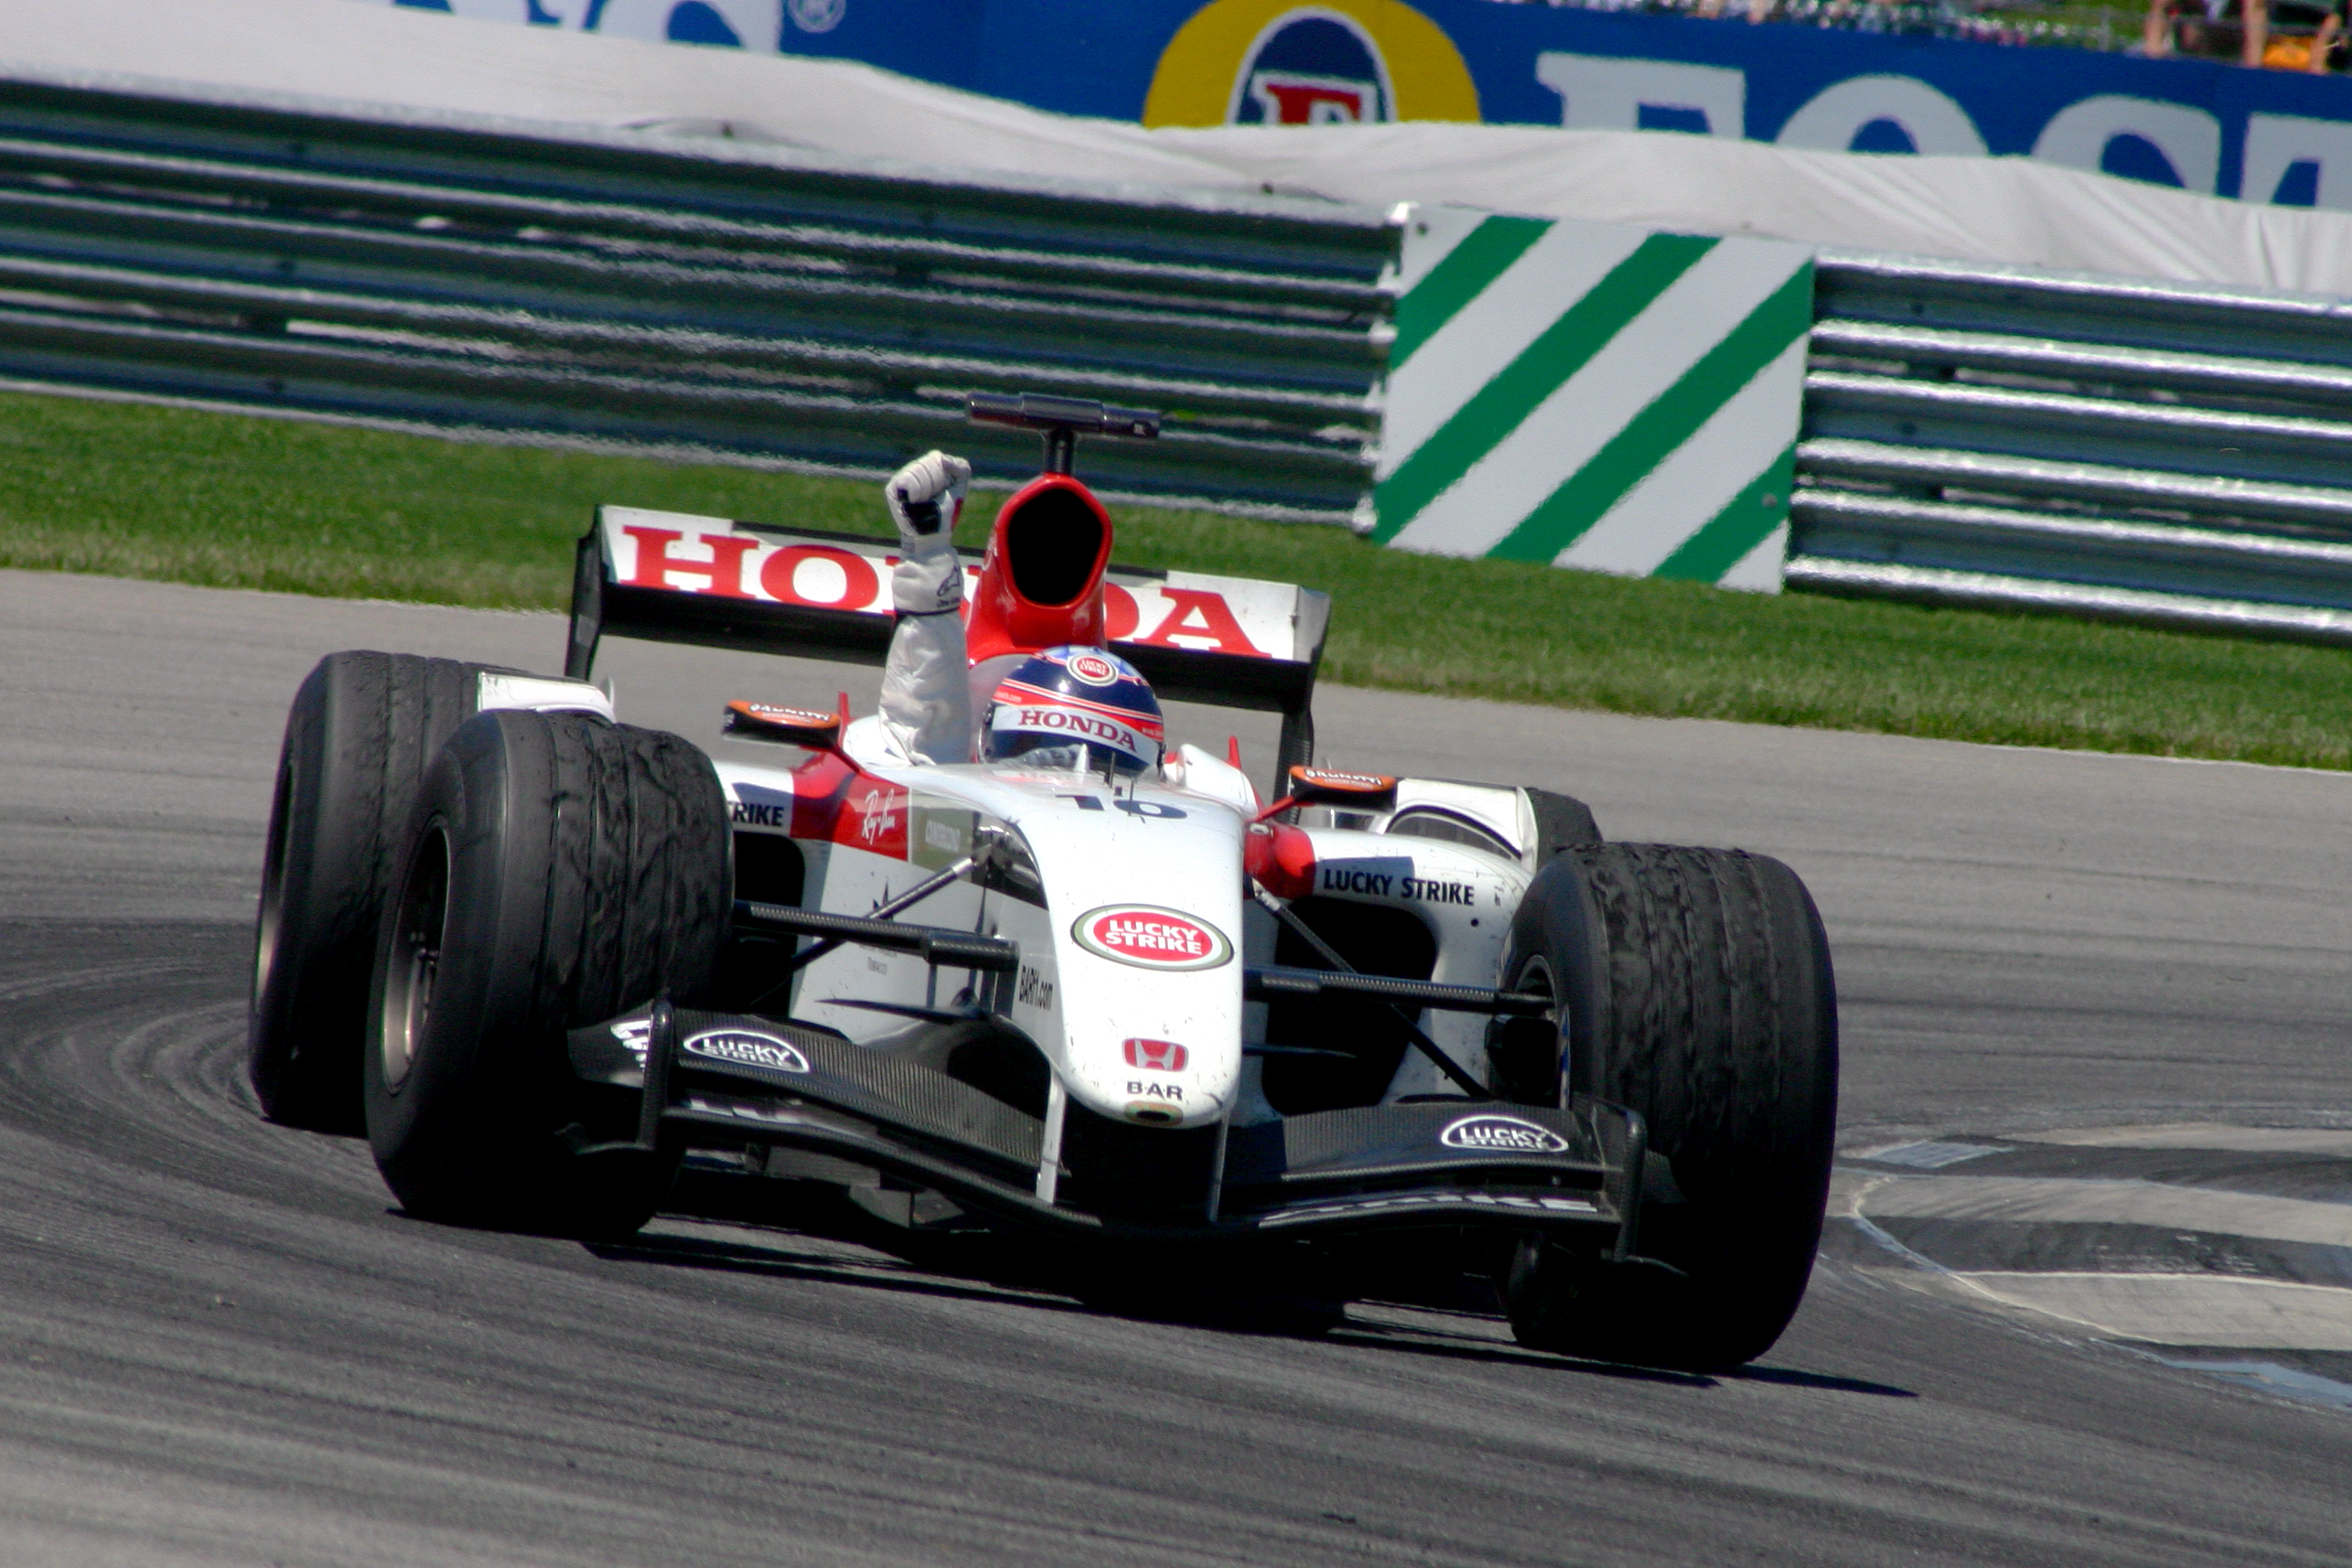 British American Racing ou BAR de 2004 - Globo Esporte e a Formula 1